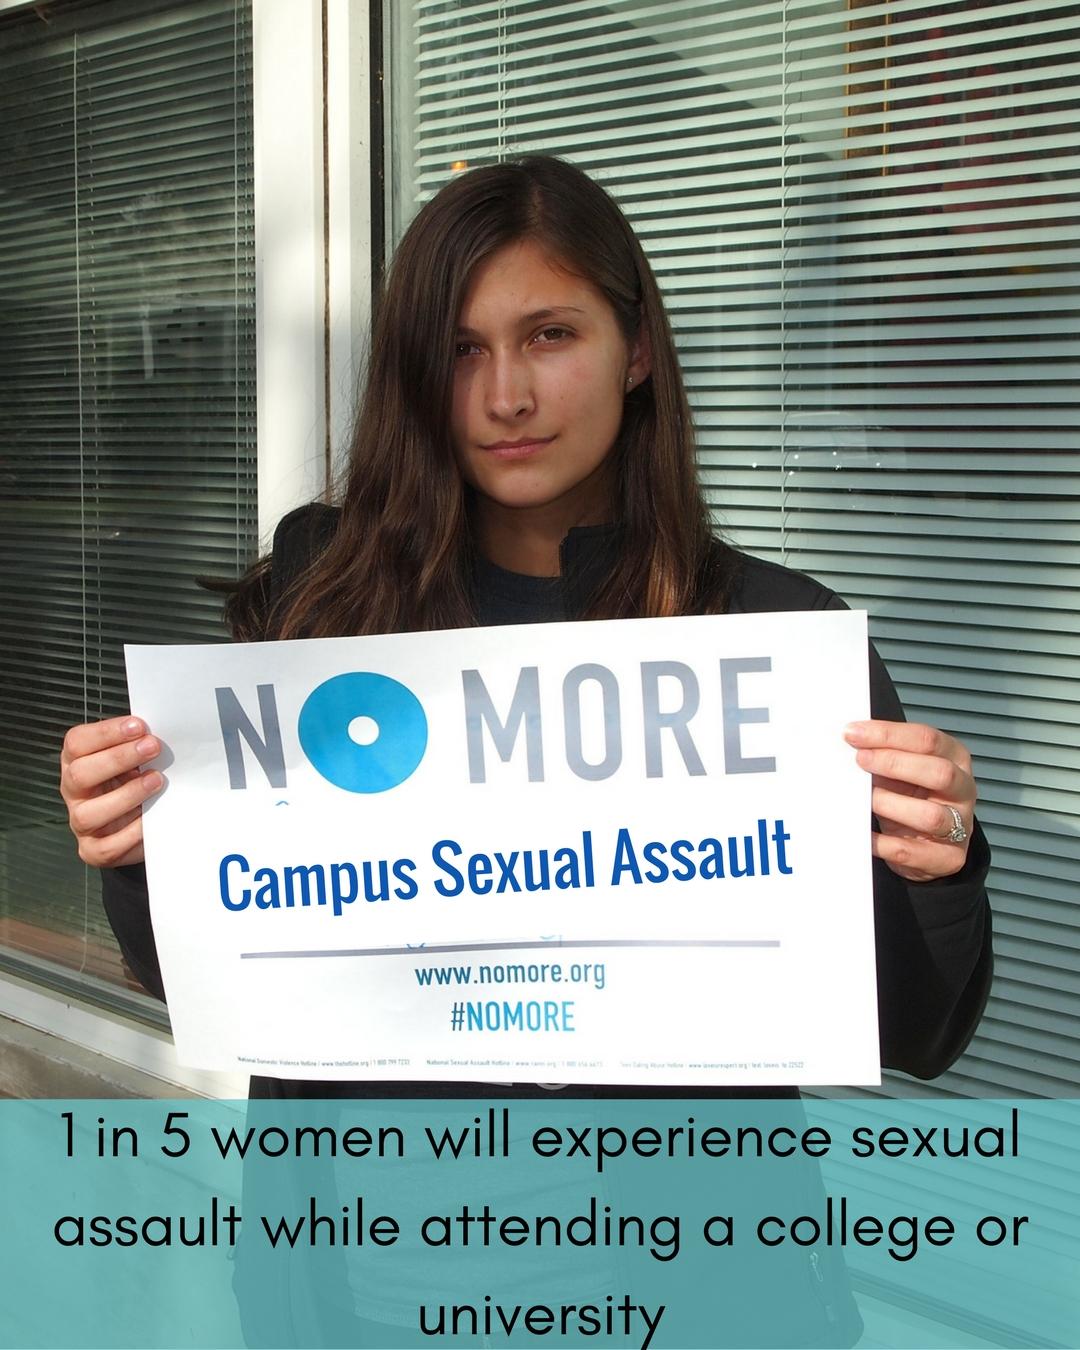 No More Campaign-Campus Sexual Assault